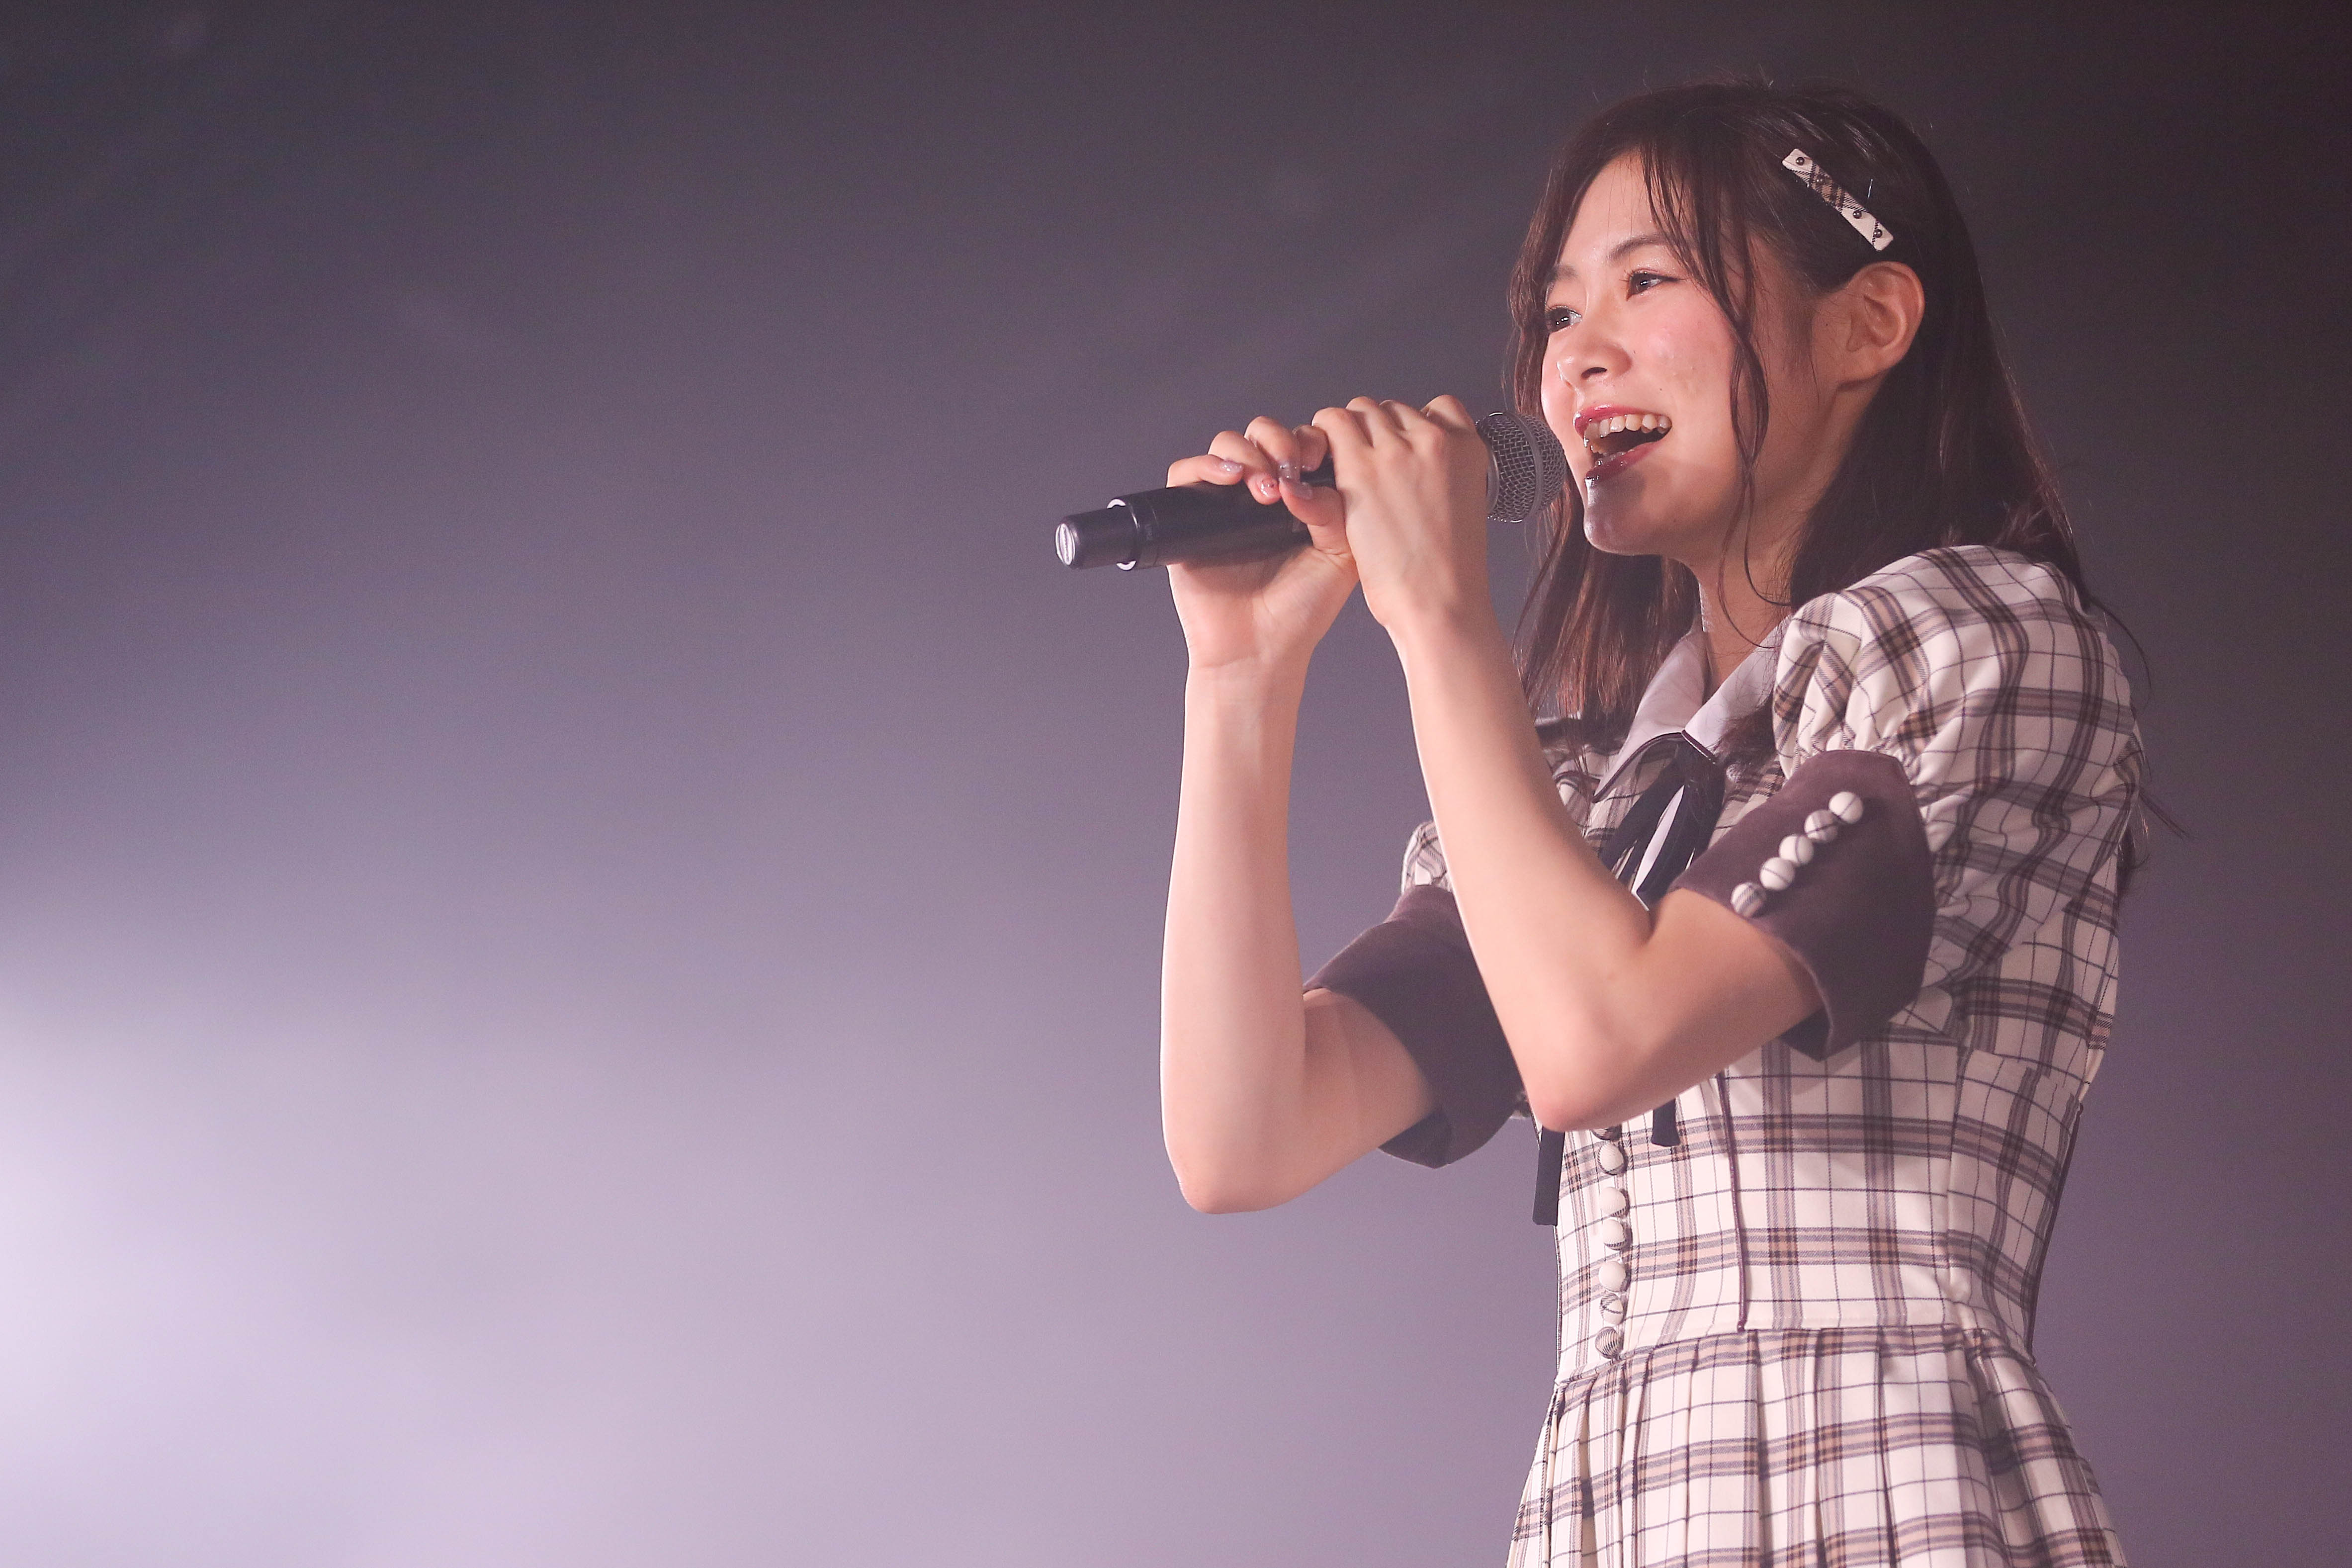 NGT48⼭⼝真帆、菅原りこ、⻑⾕川玲奈・卒業公演後のコメント発表!【写真14枚】の画像004